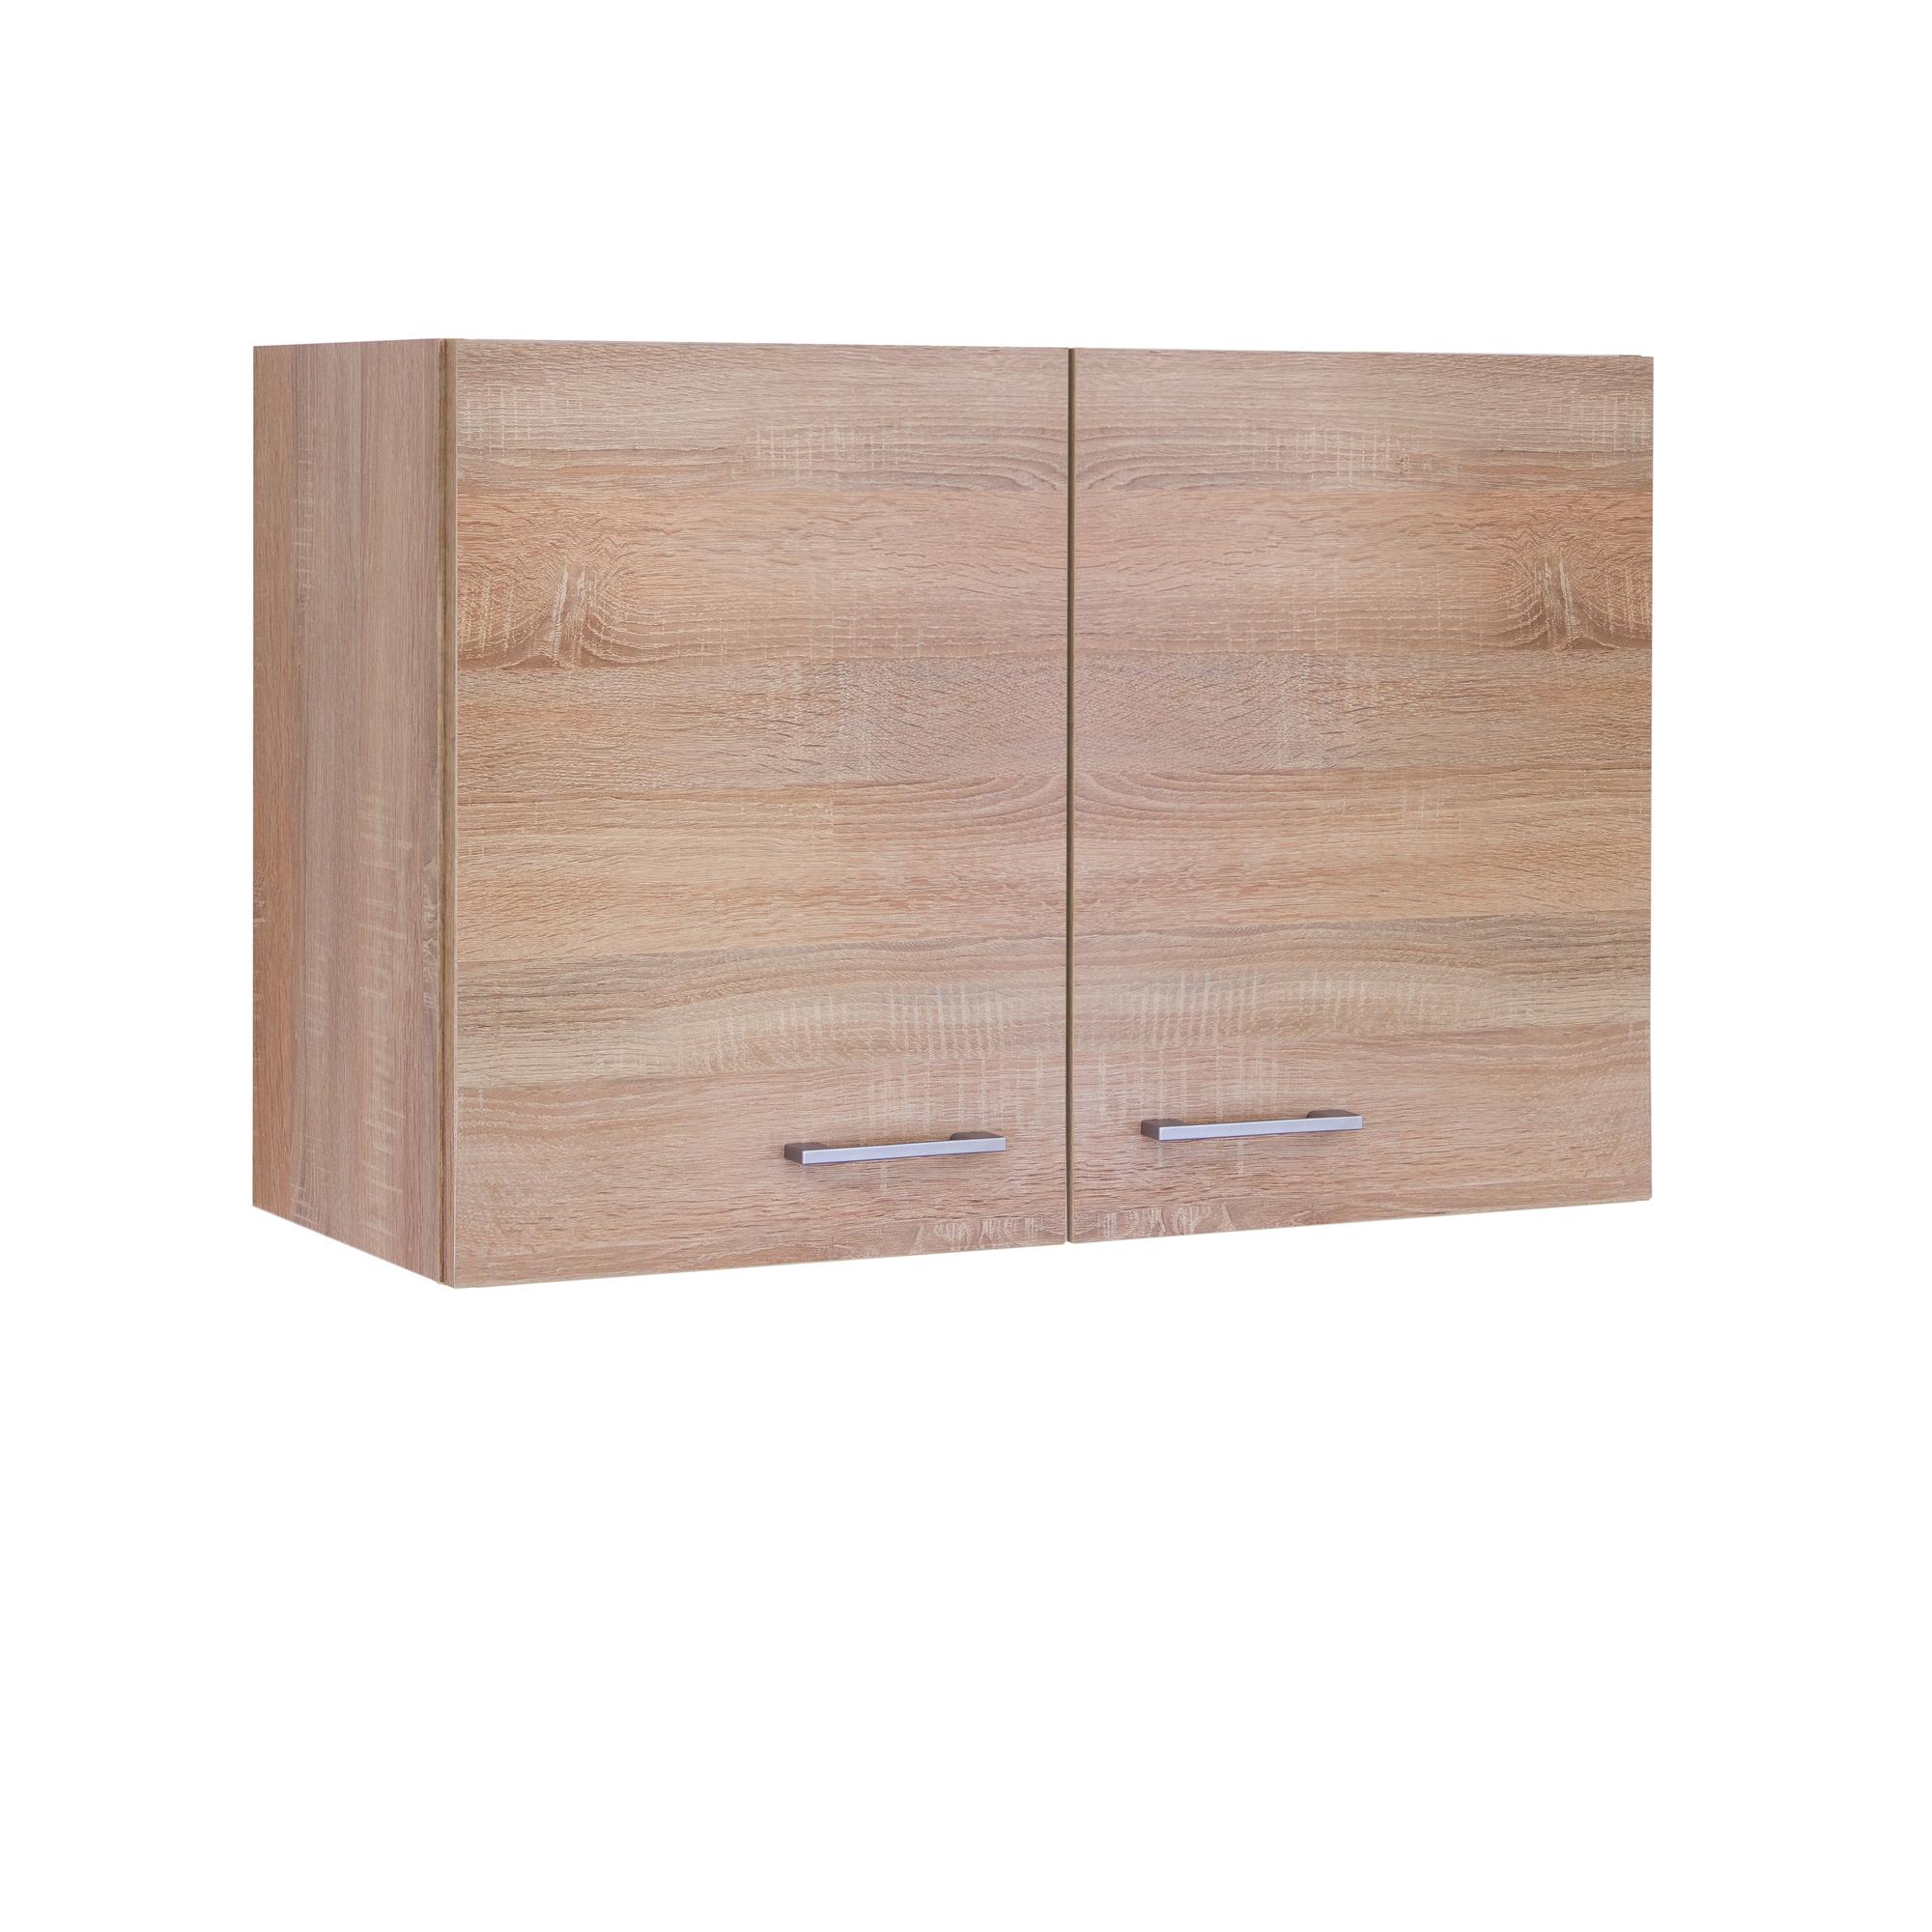 k chen h ngeschrank rom 2 t rig 80 cm breit eiche sonoma k che h ngeschr nke. Black Bedroom Furniture Sets. Home Design Ideas